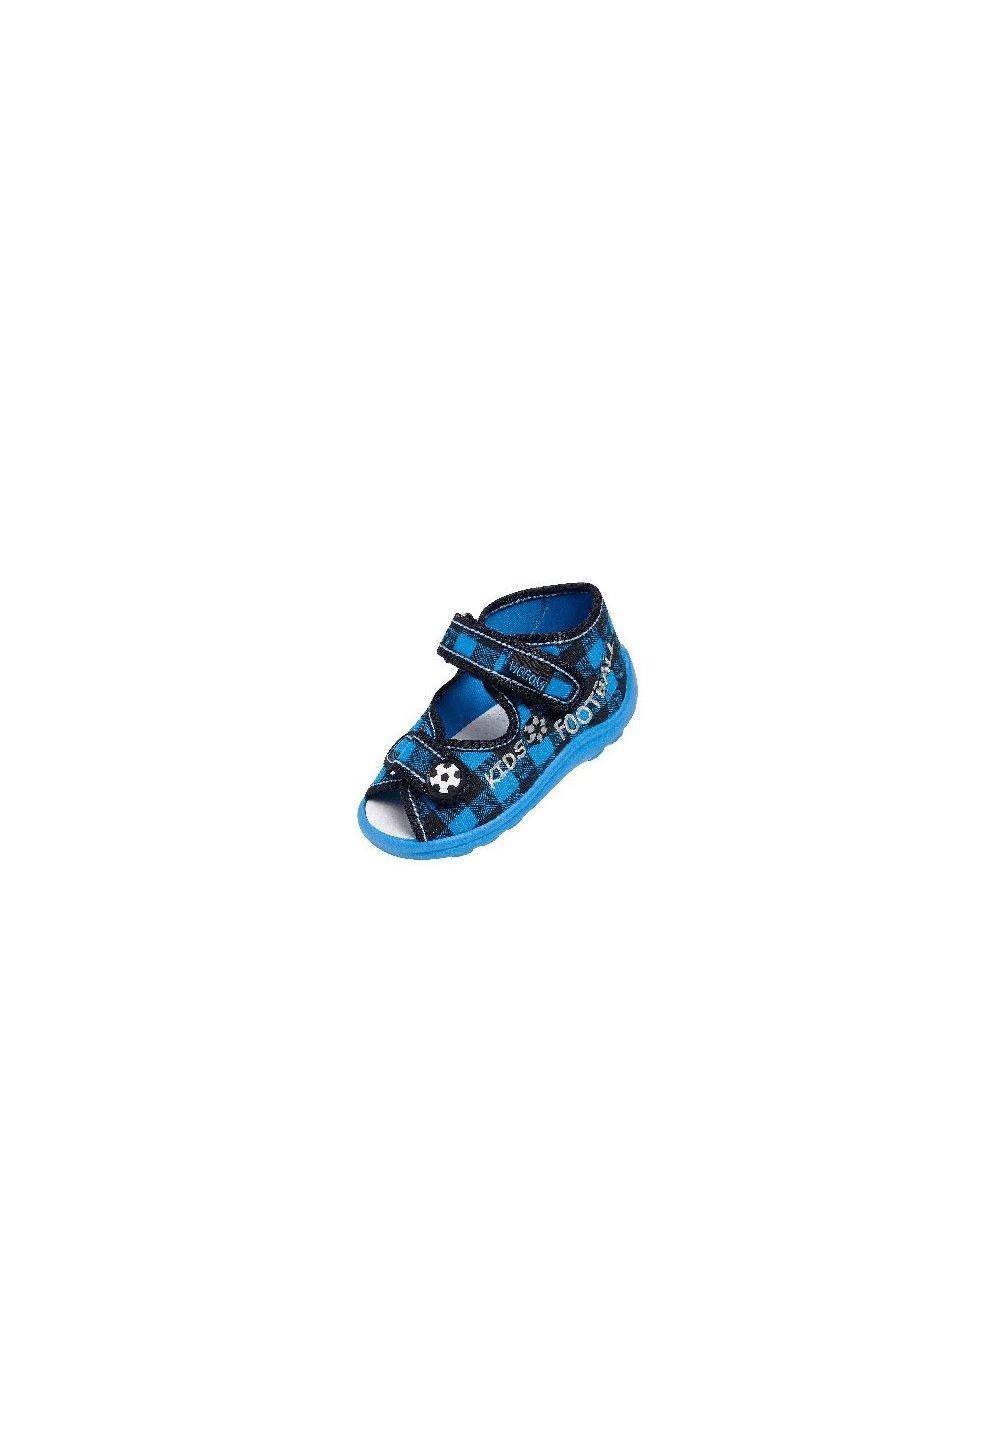 Incaltaminte panza, albastre in carouri, Karo imagine